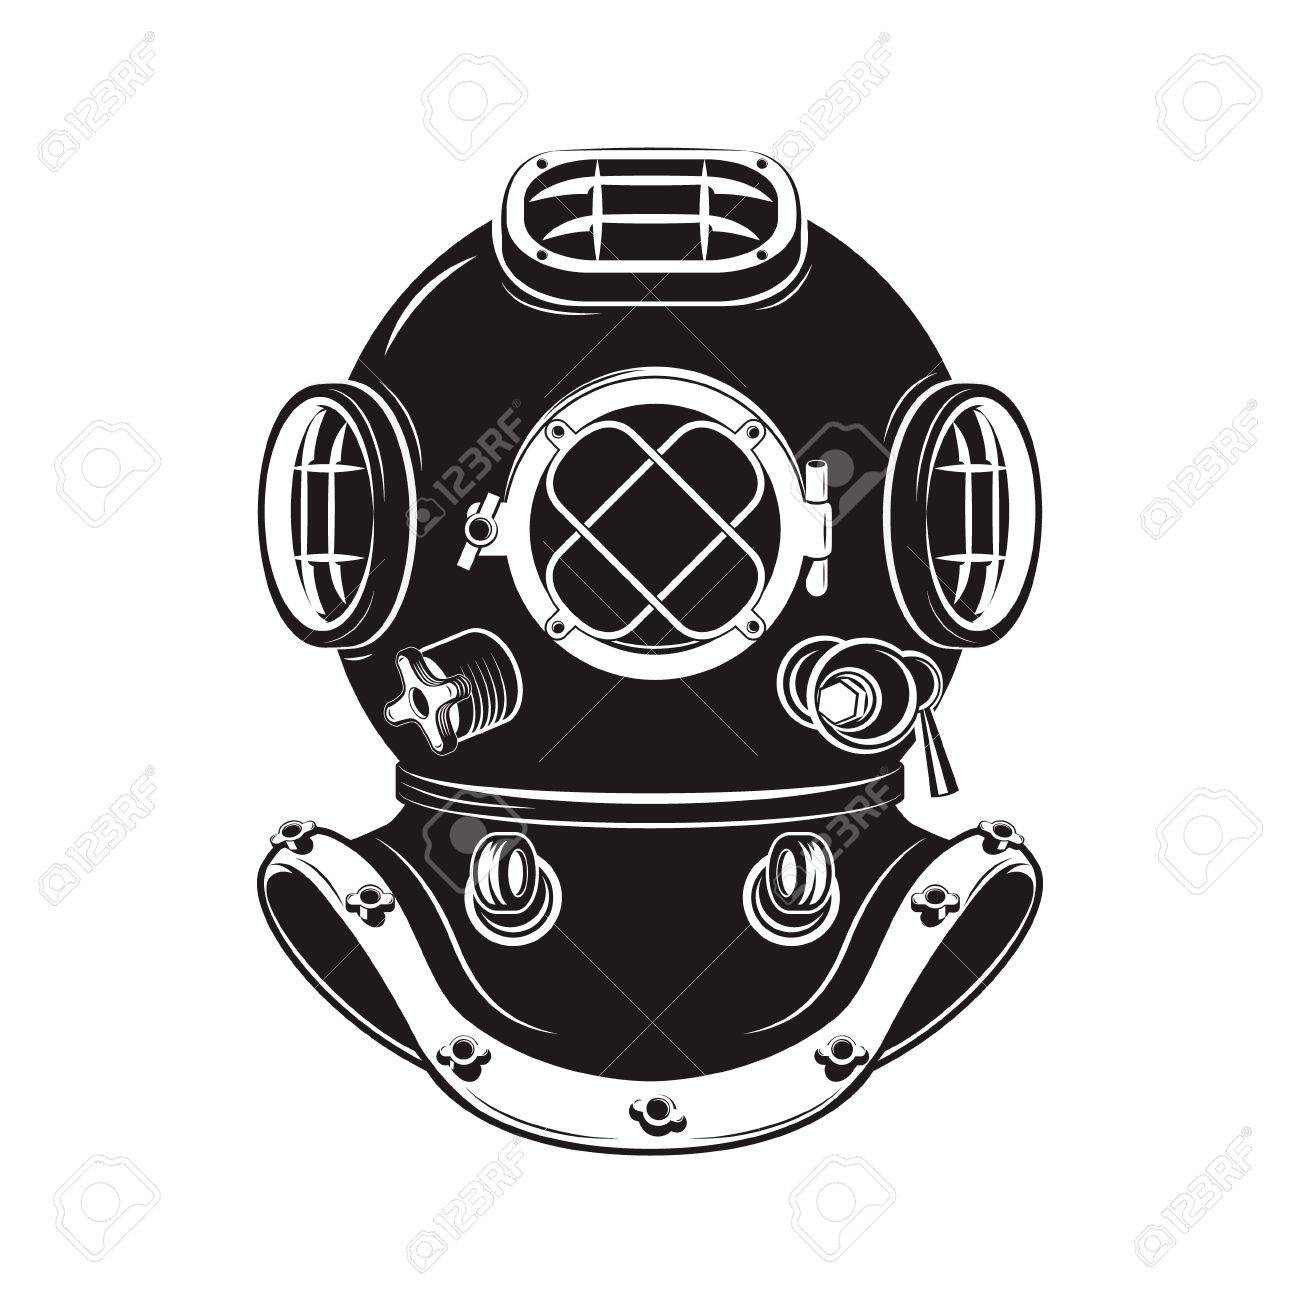 Old style diver helmet isolated on white background. Design element for t-shirt print, poster, emblem. Vector illustration. - 59976797